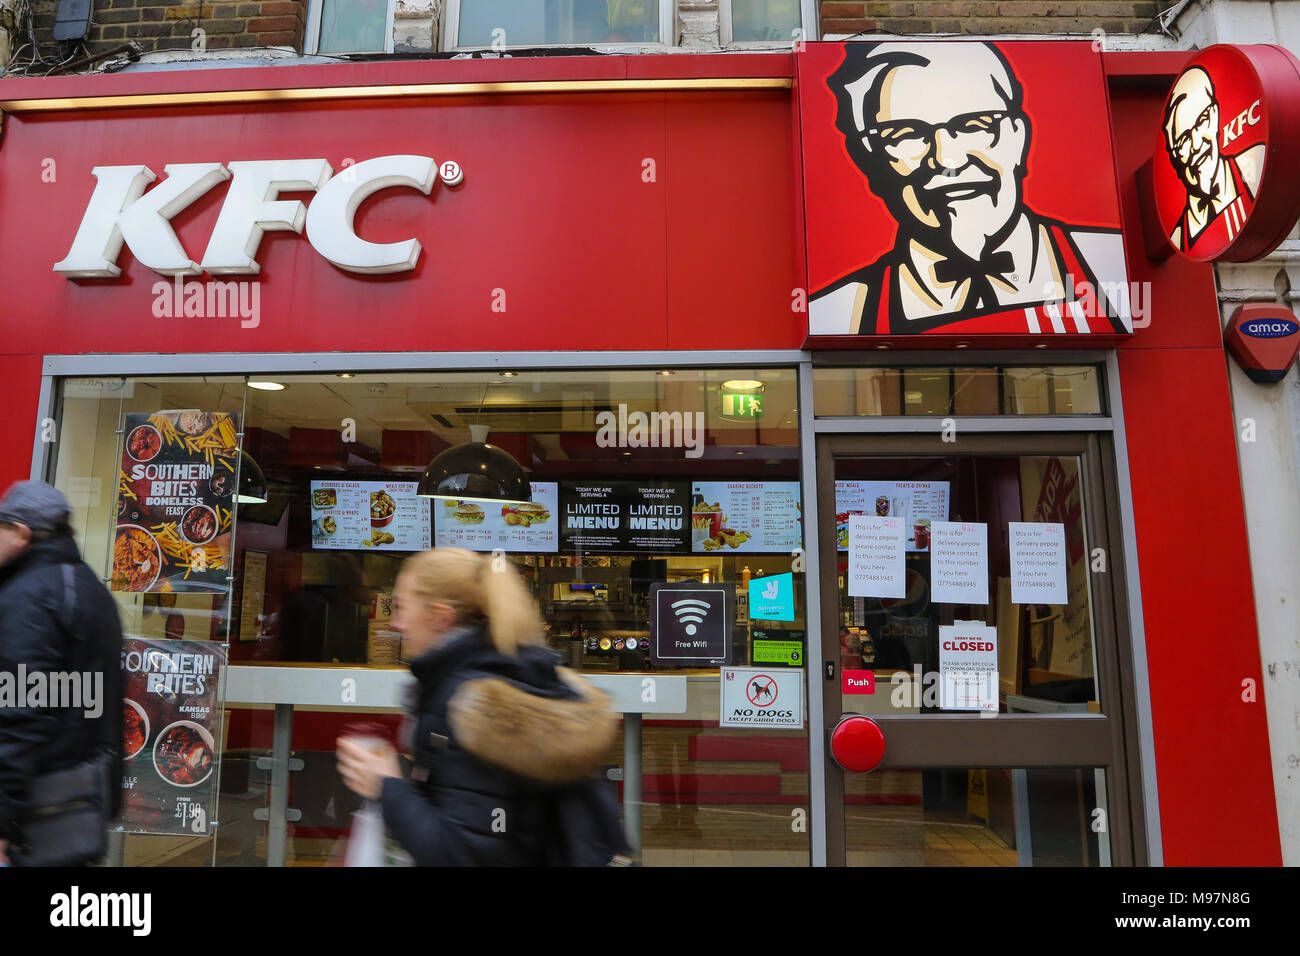 Kentucky Fried Chicken (KFC) fast food restaurant in Wood Green